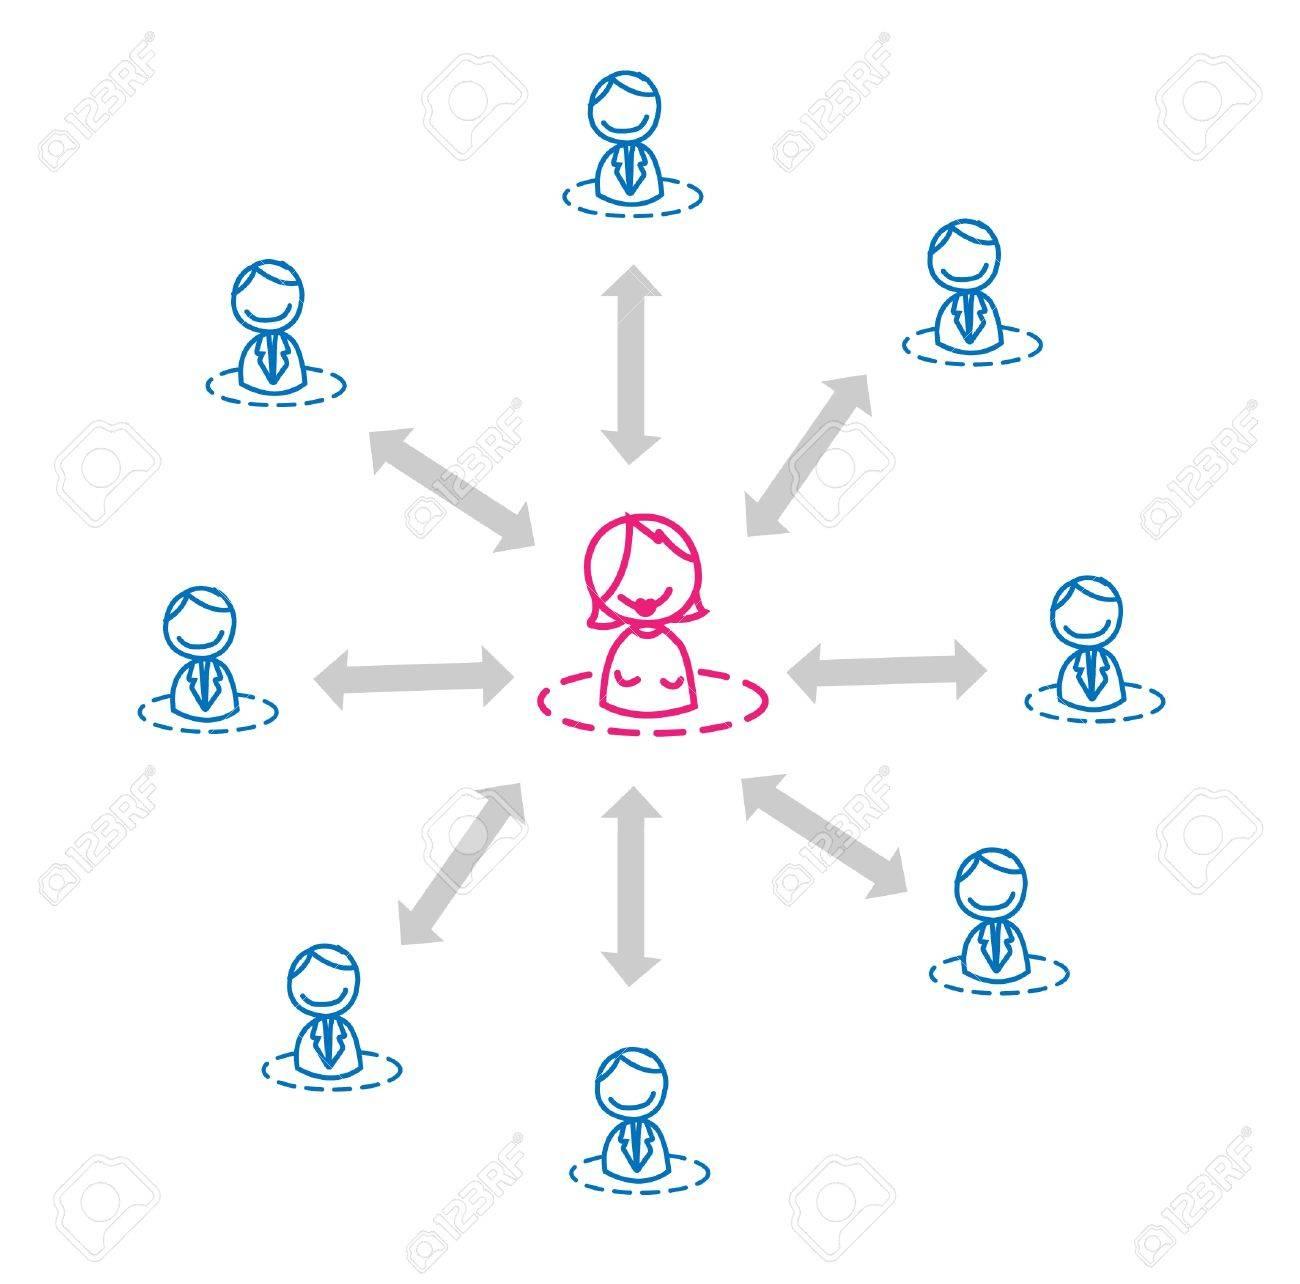 women leader network Stock Vector - 11079607